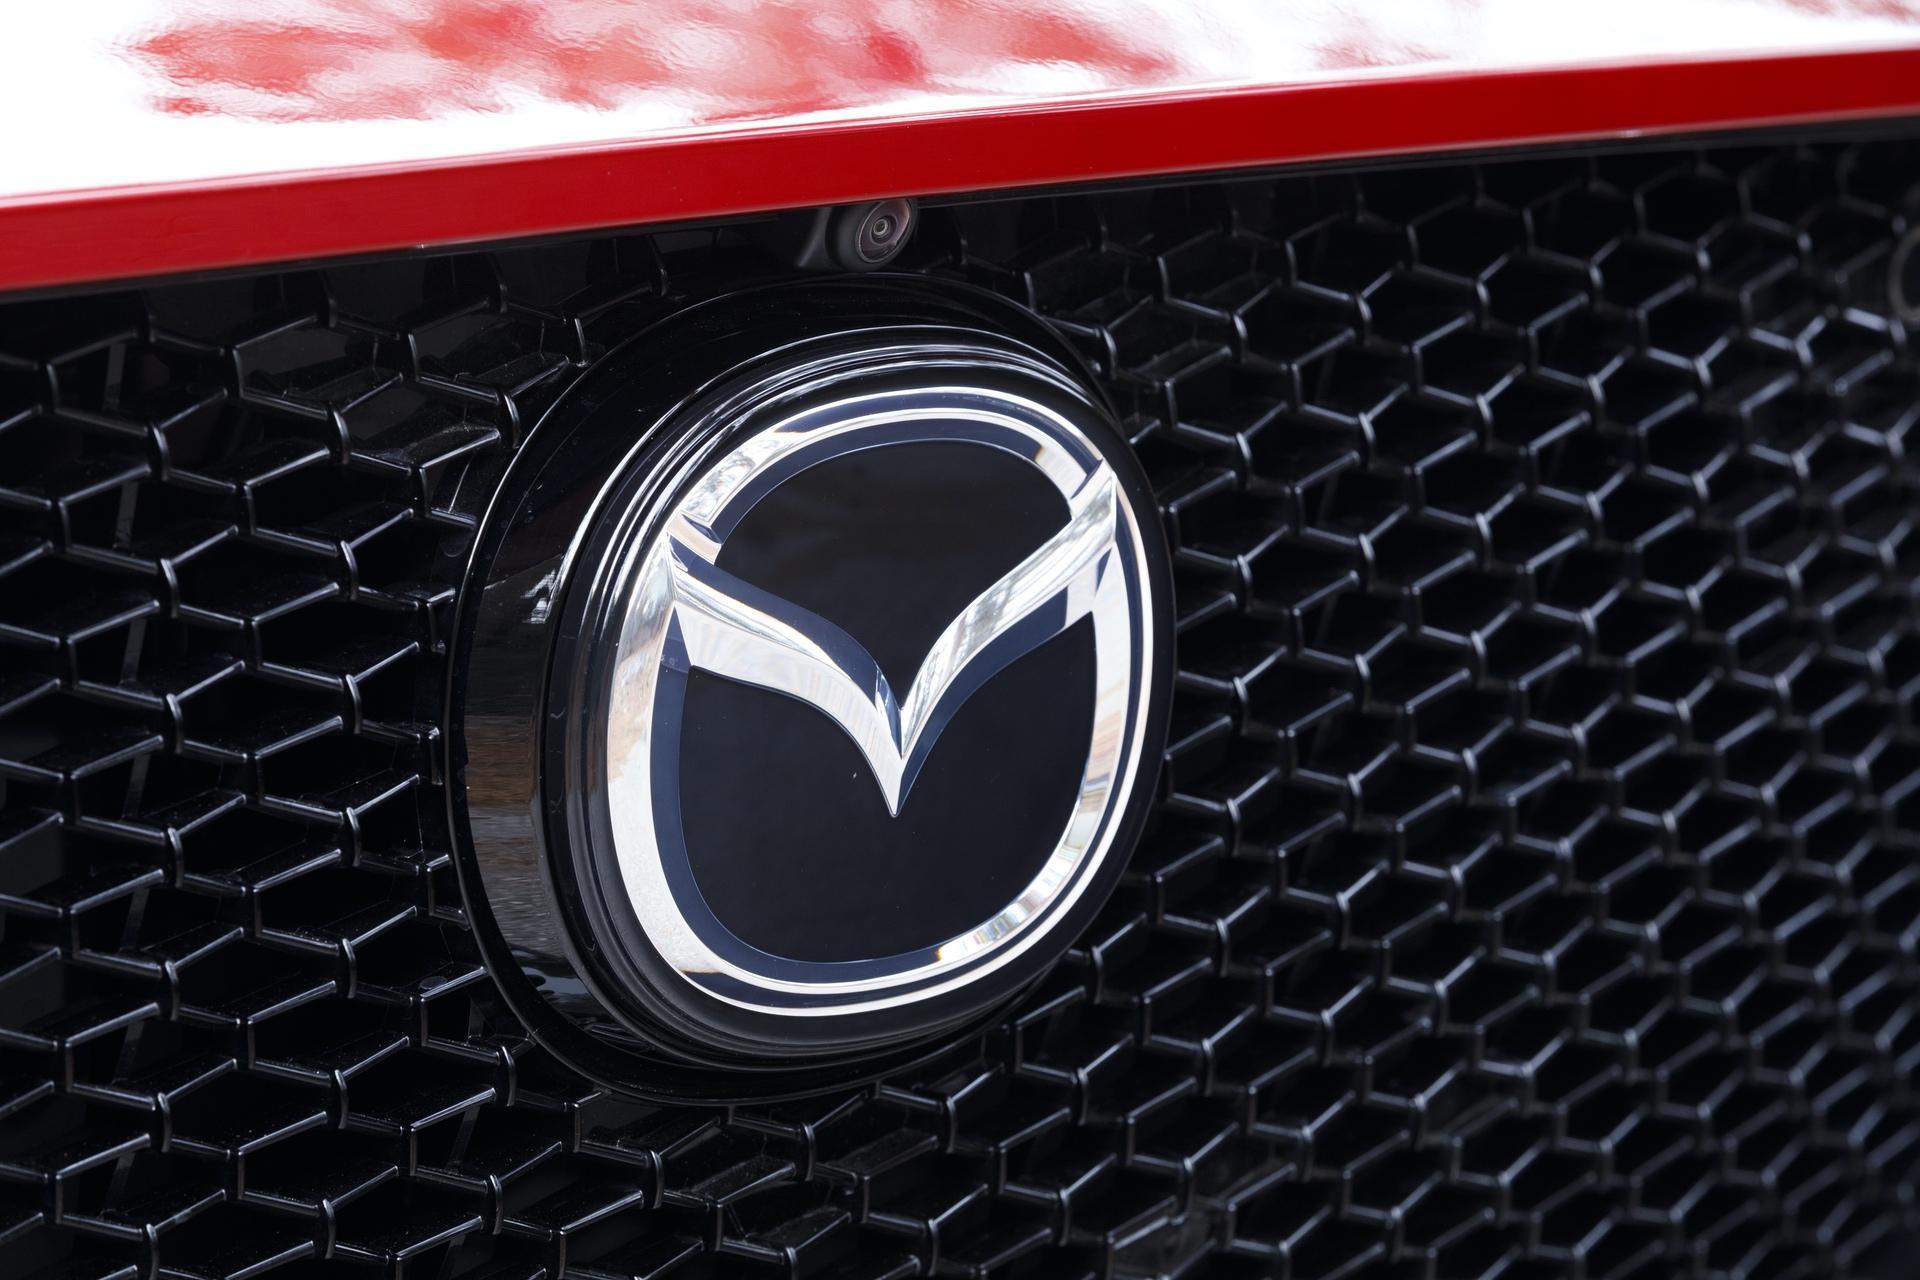 2019-Mazda3-Hatchback_18